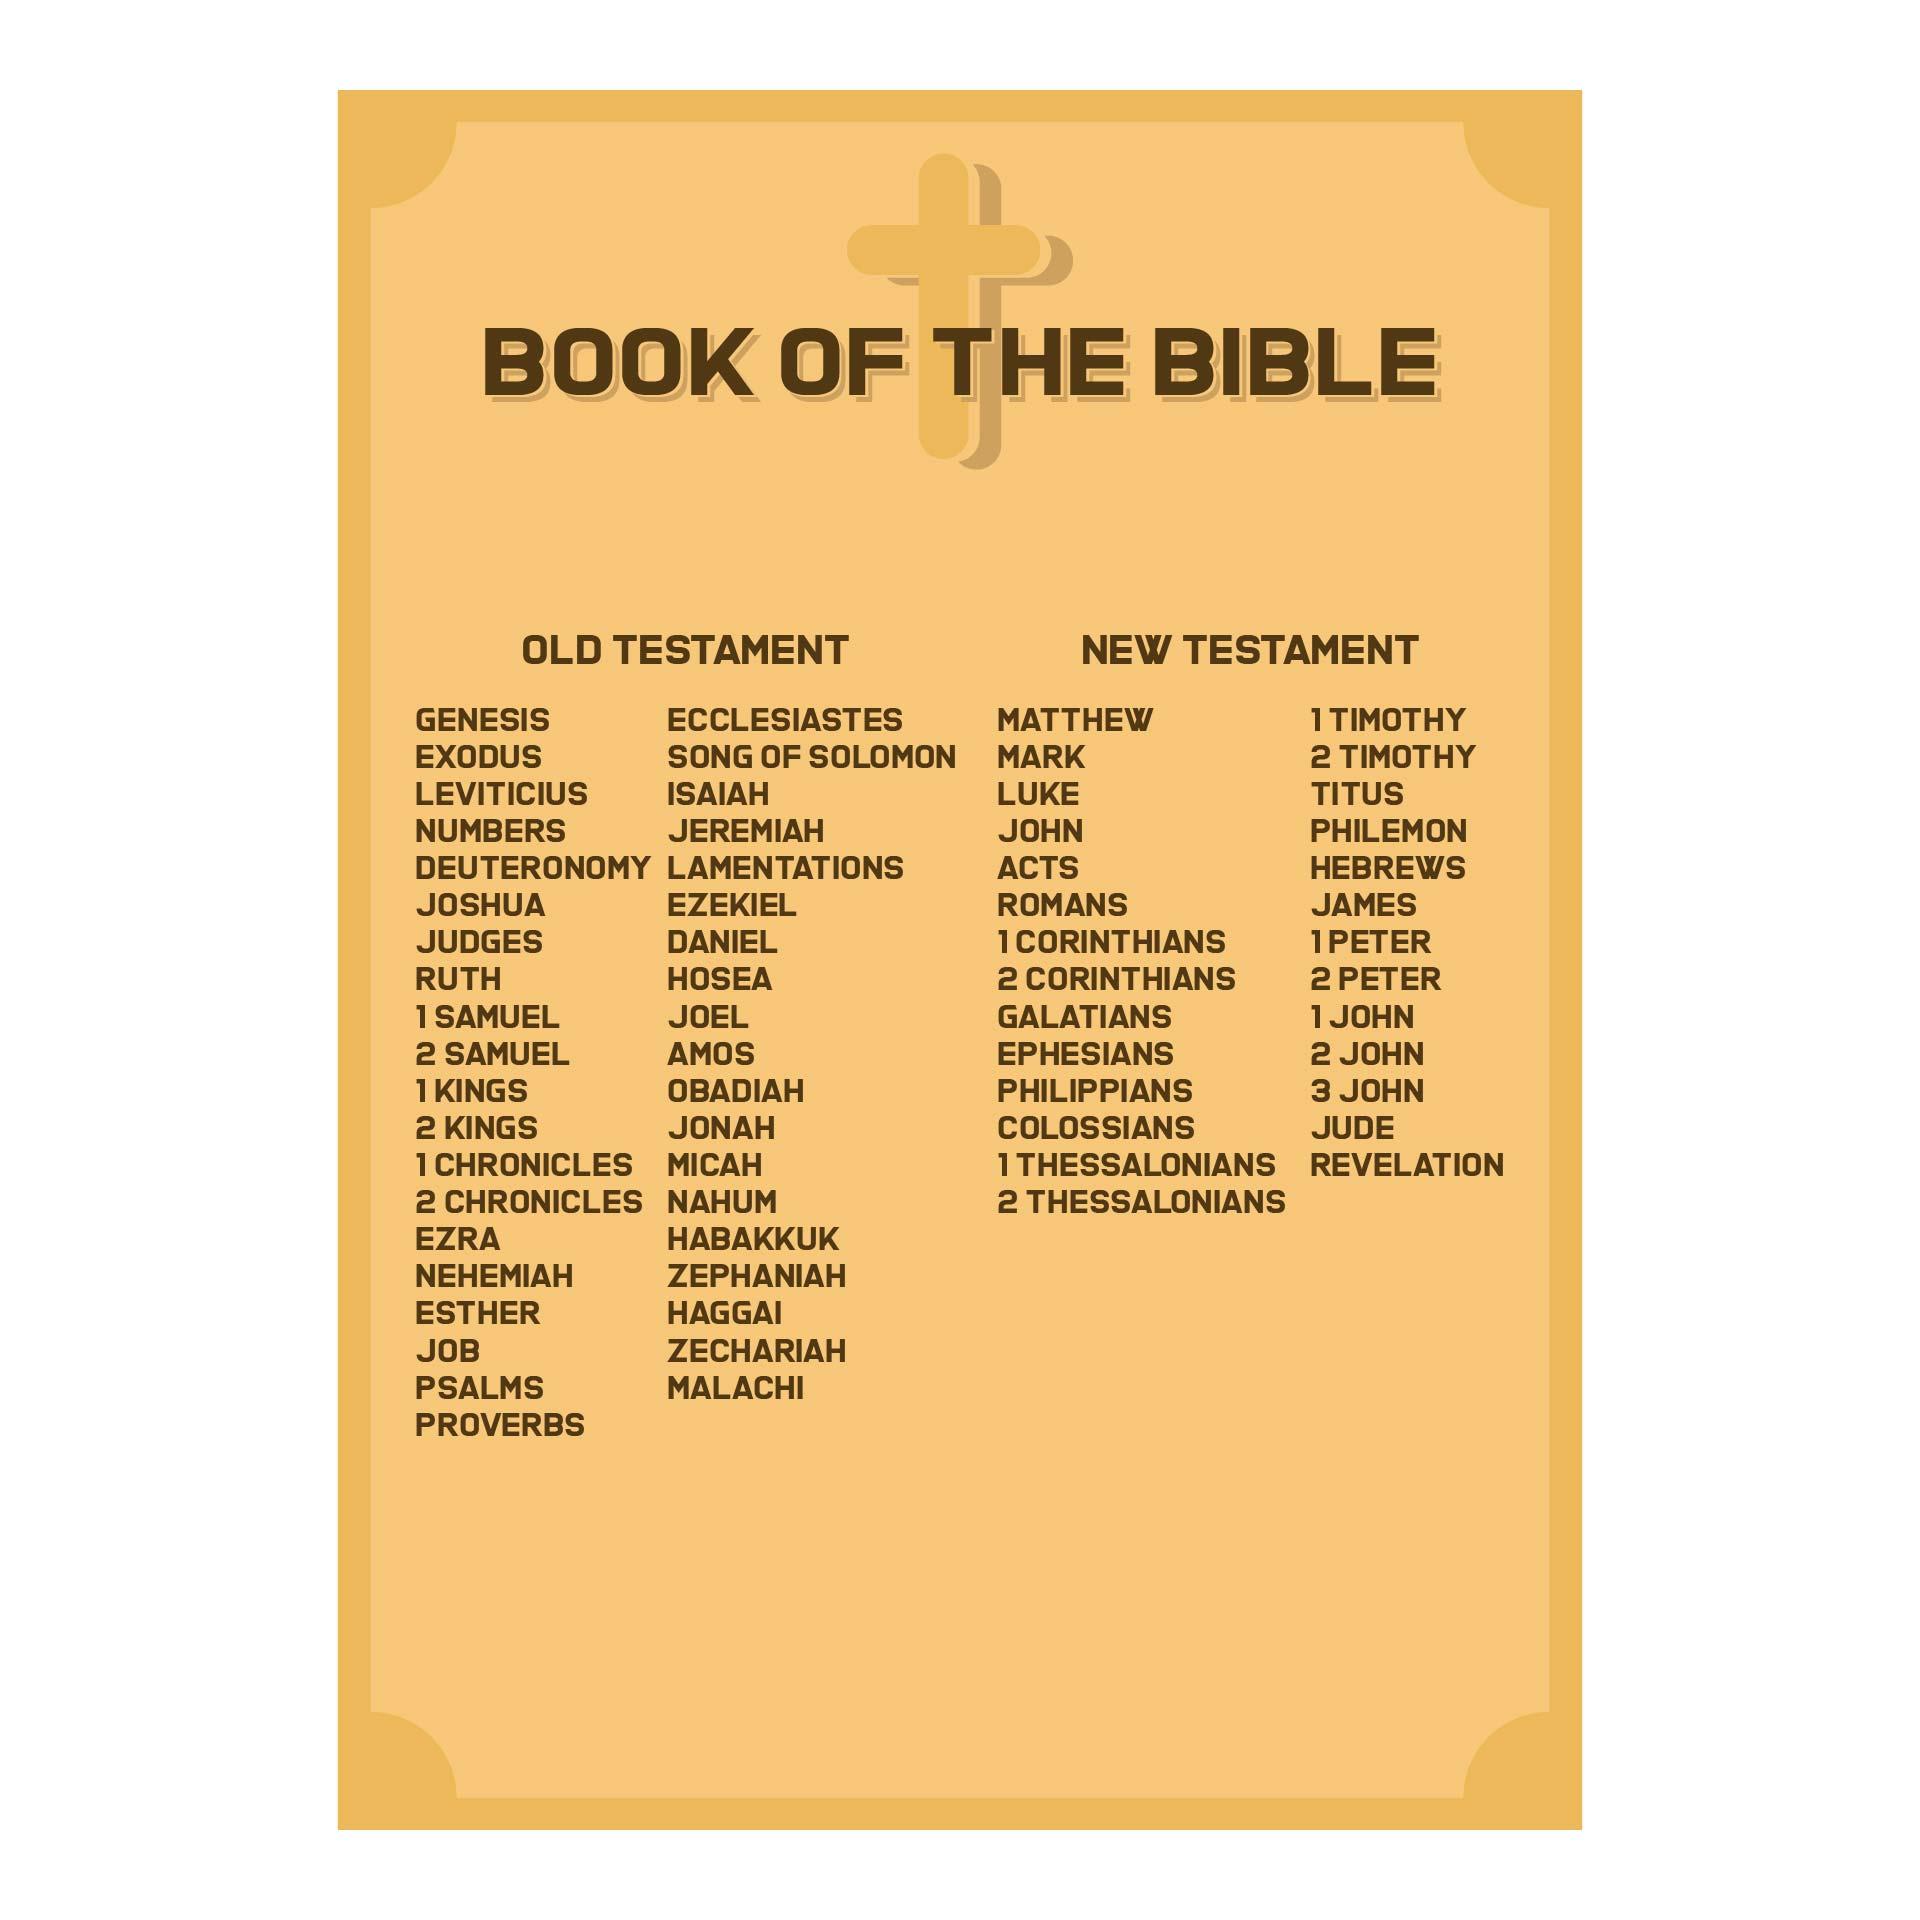 Books of the bib